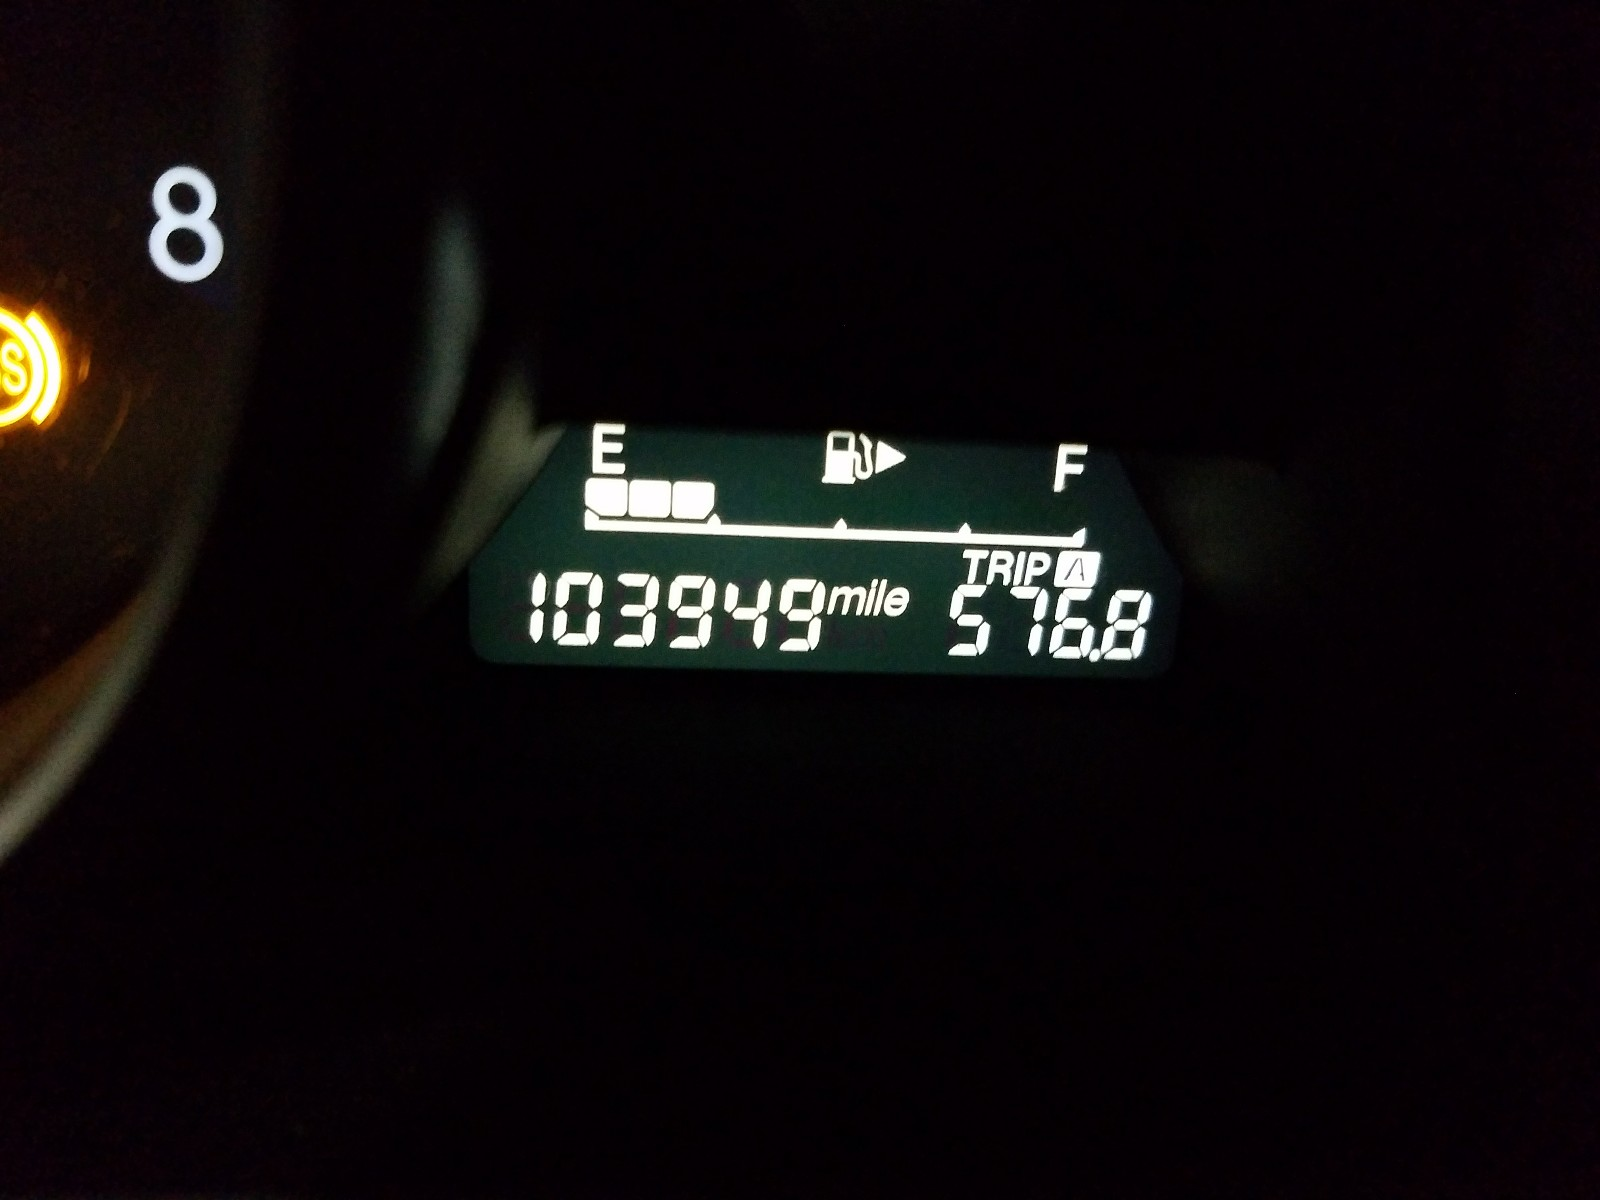 JM1BL1V75C1602466 - 2012 Mazda 3 I 2.0L front view